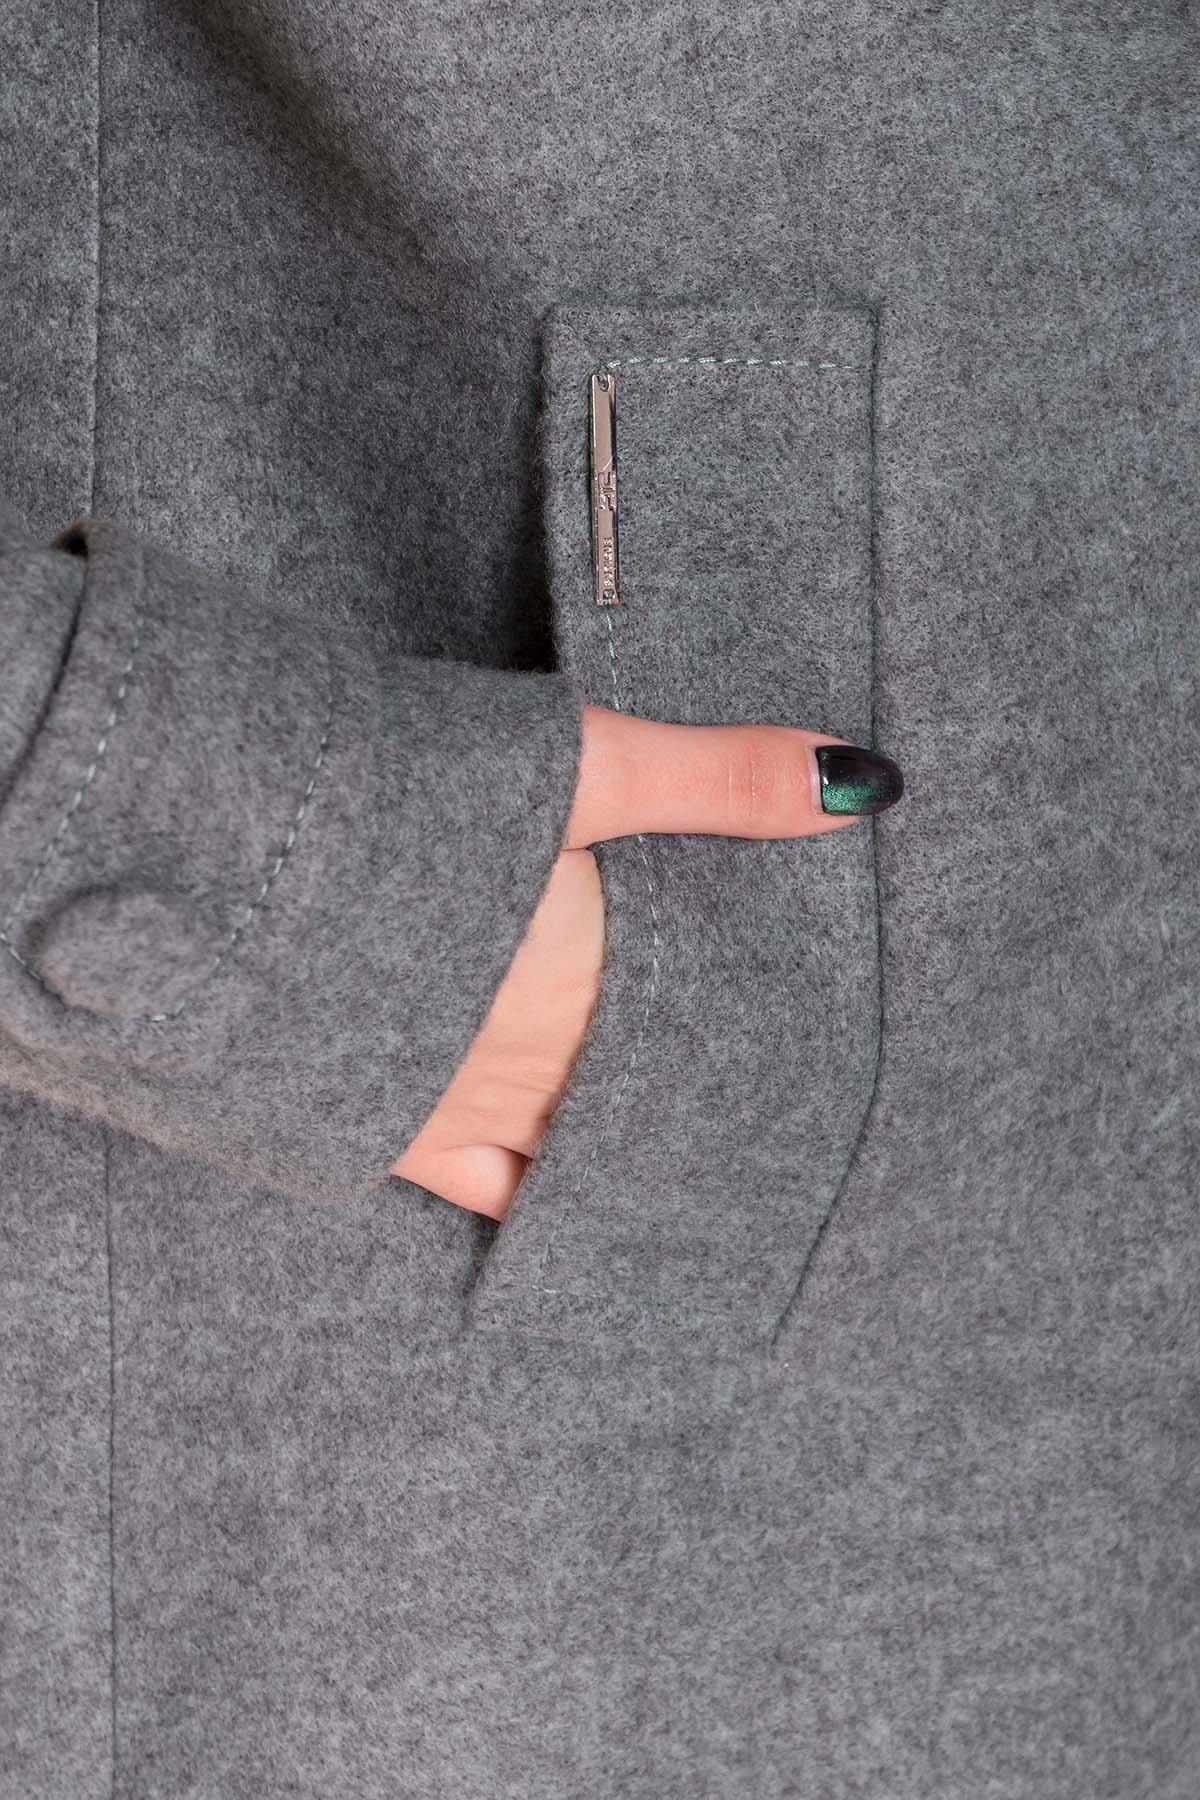 Пальто Нейт 6352 АРТ. 41182 Цвет: Олива - фото 5, интернет магазин tm-modus.ru